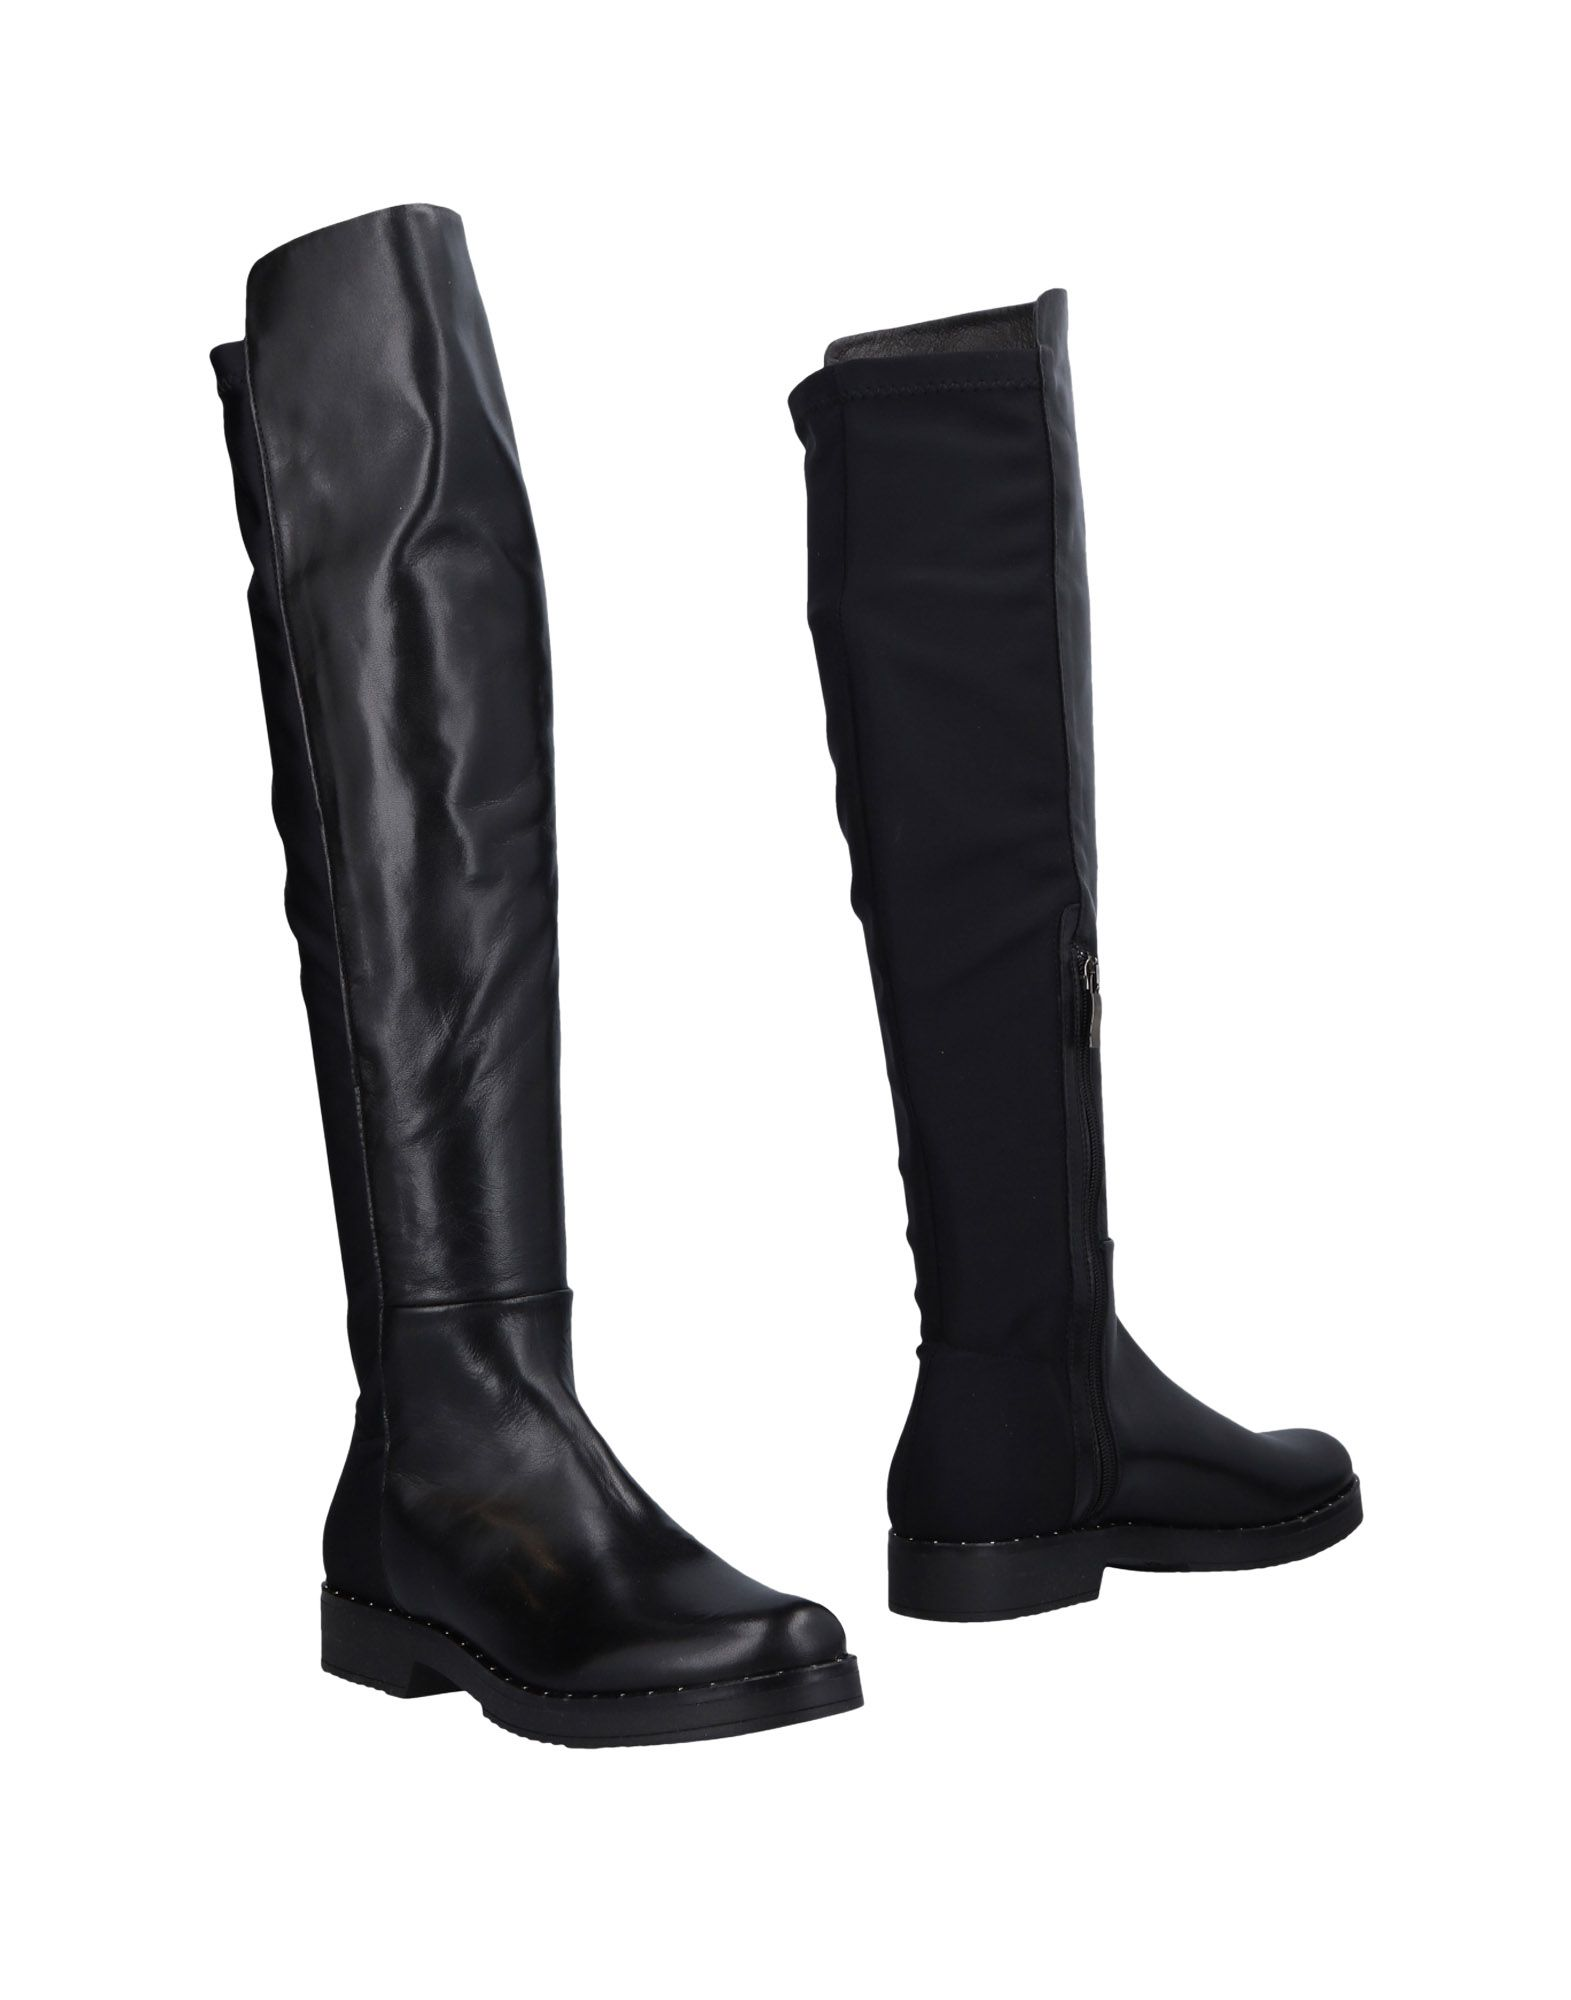 Moda Stivali Mally Mally Stivali Donna - 11474199QM 3f0c33